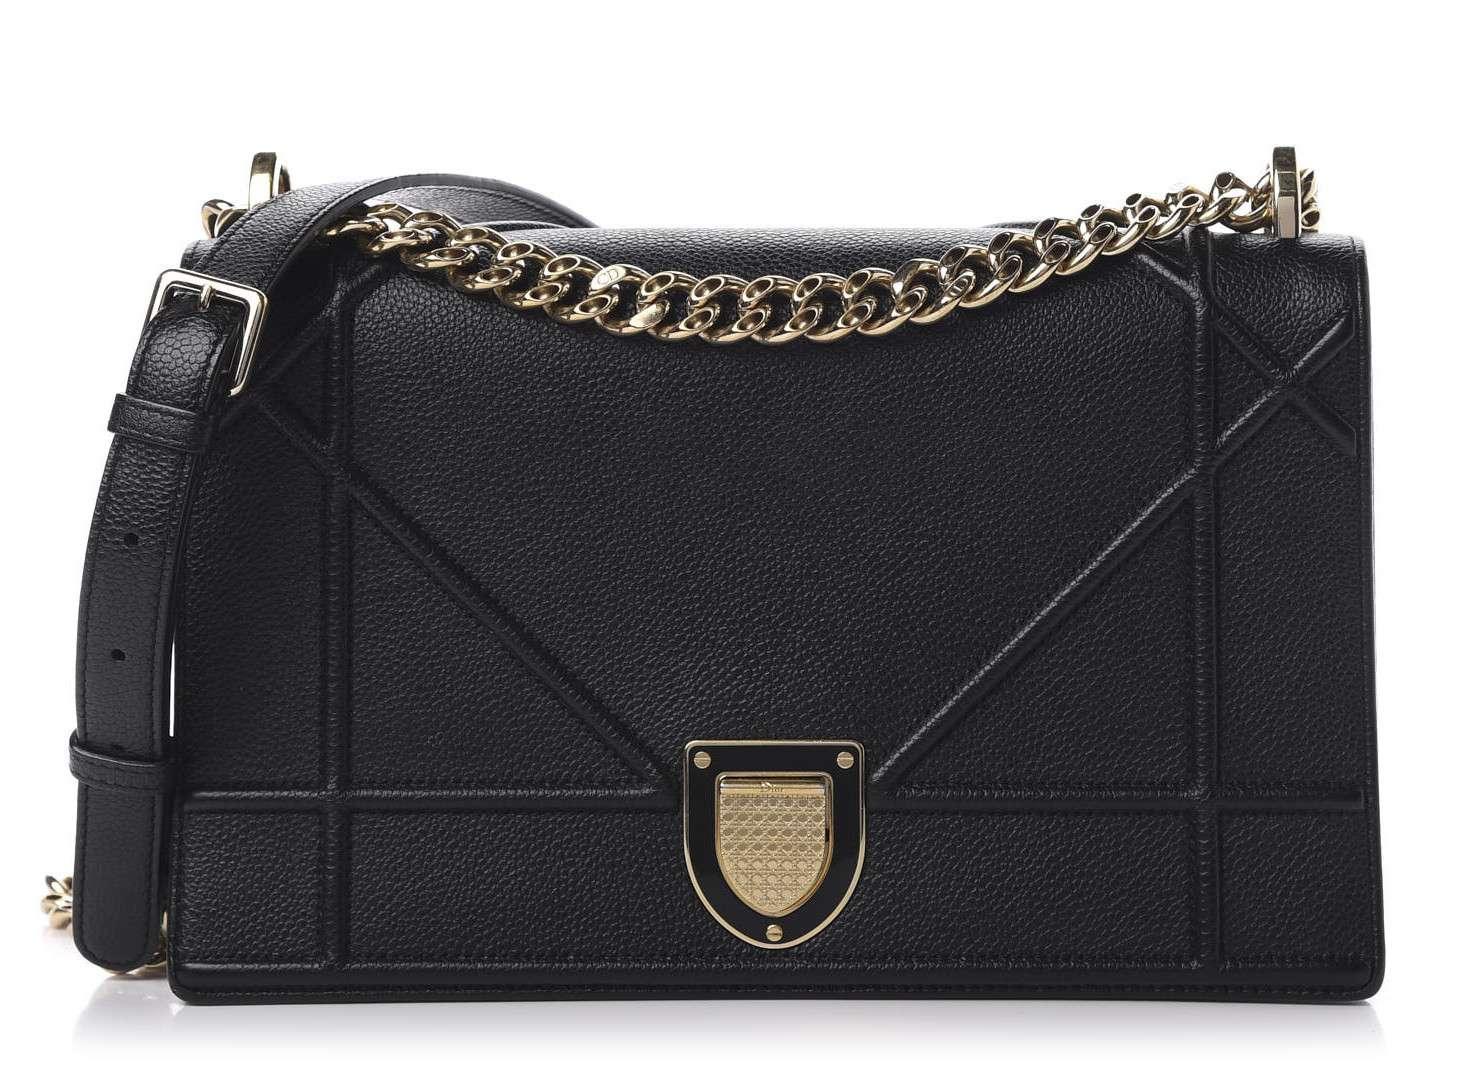 Dior Diorama Small Flap Bag